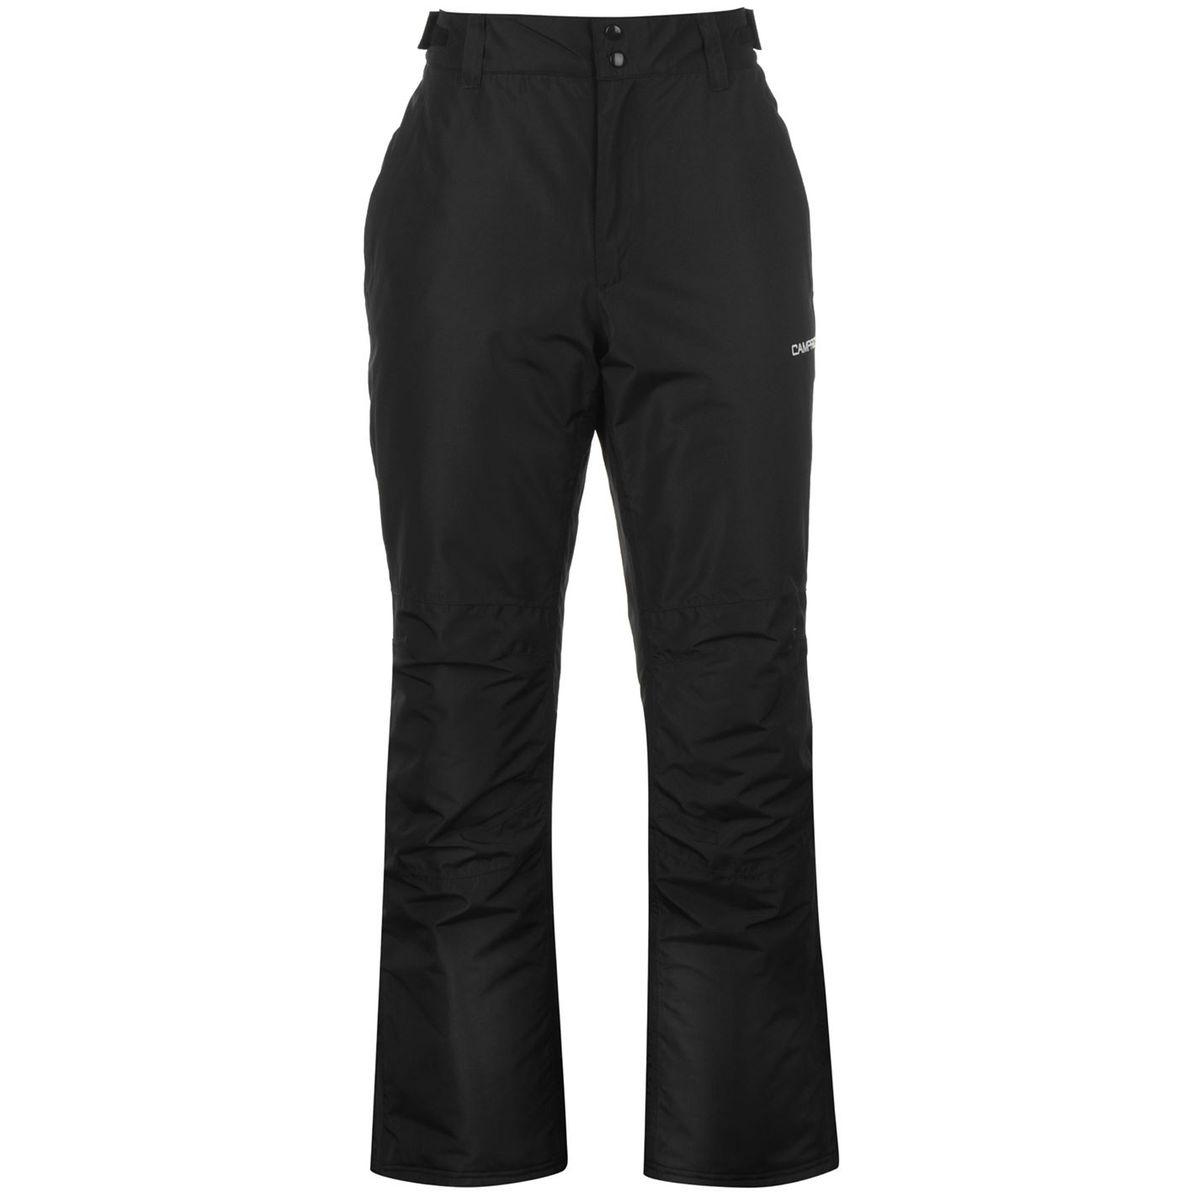 Pantalon de ski respirant